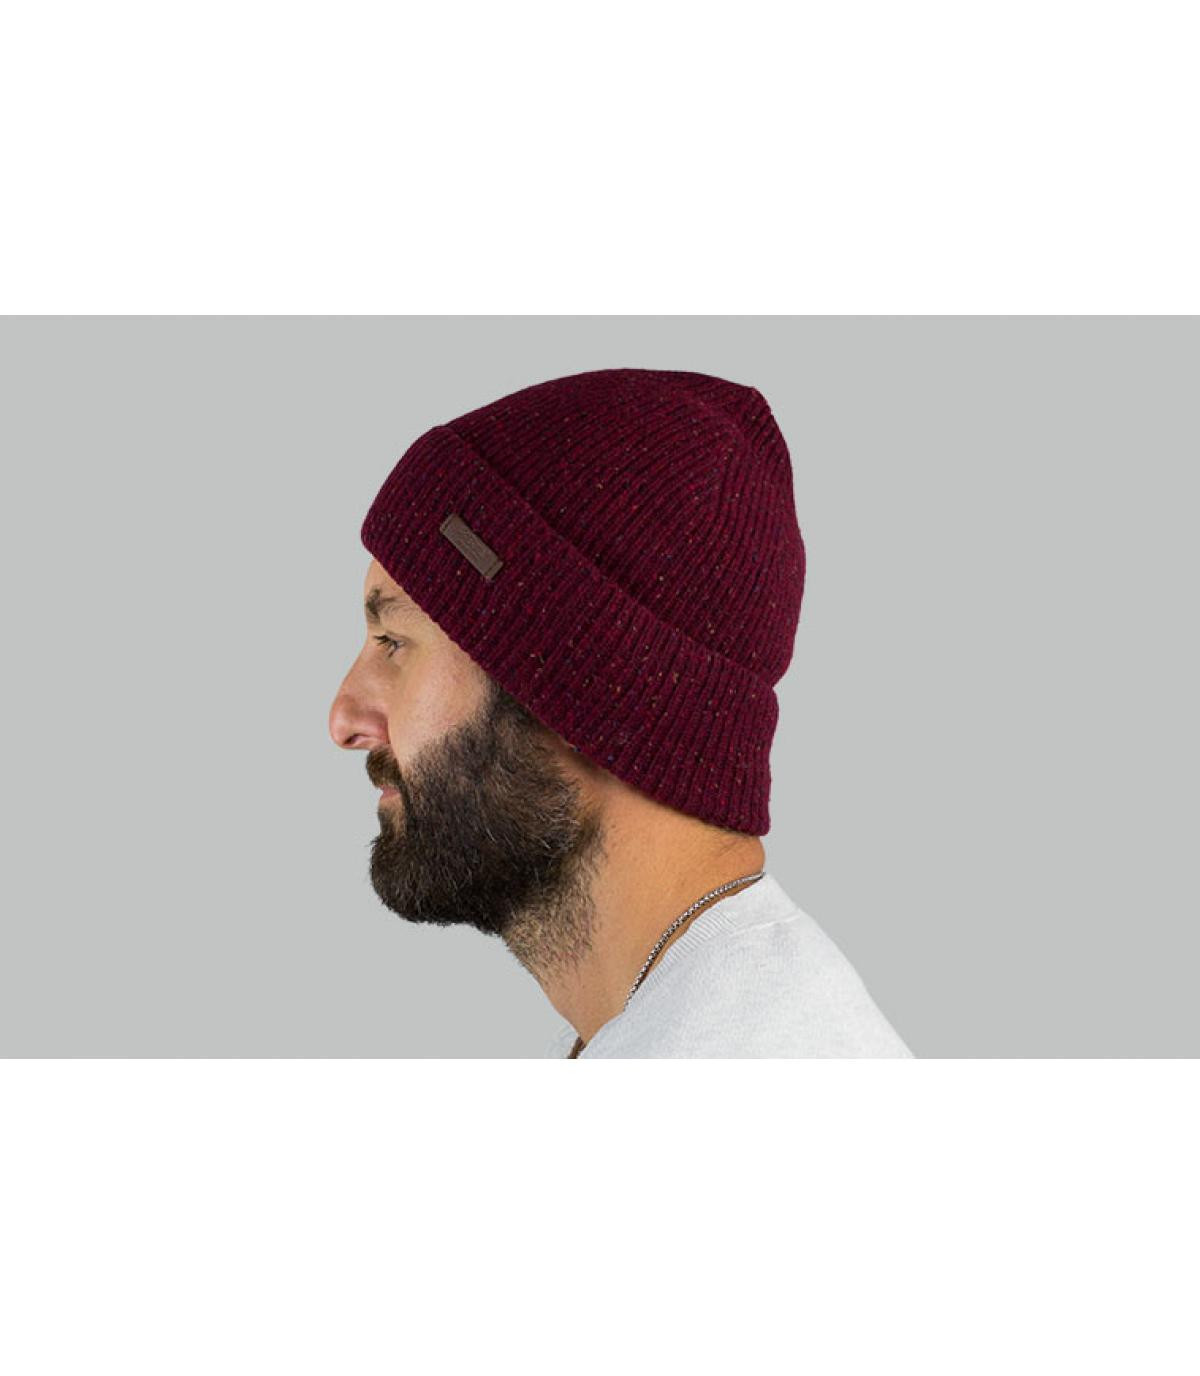 Mütze Revers bordeaux meliert